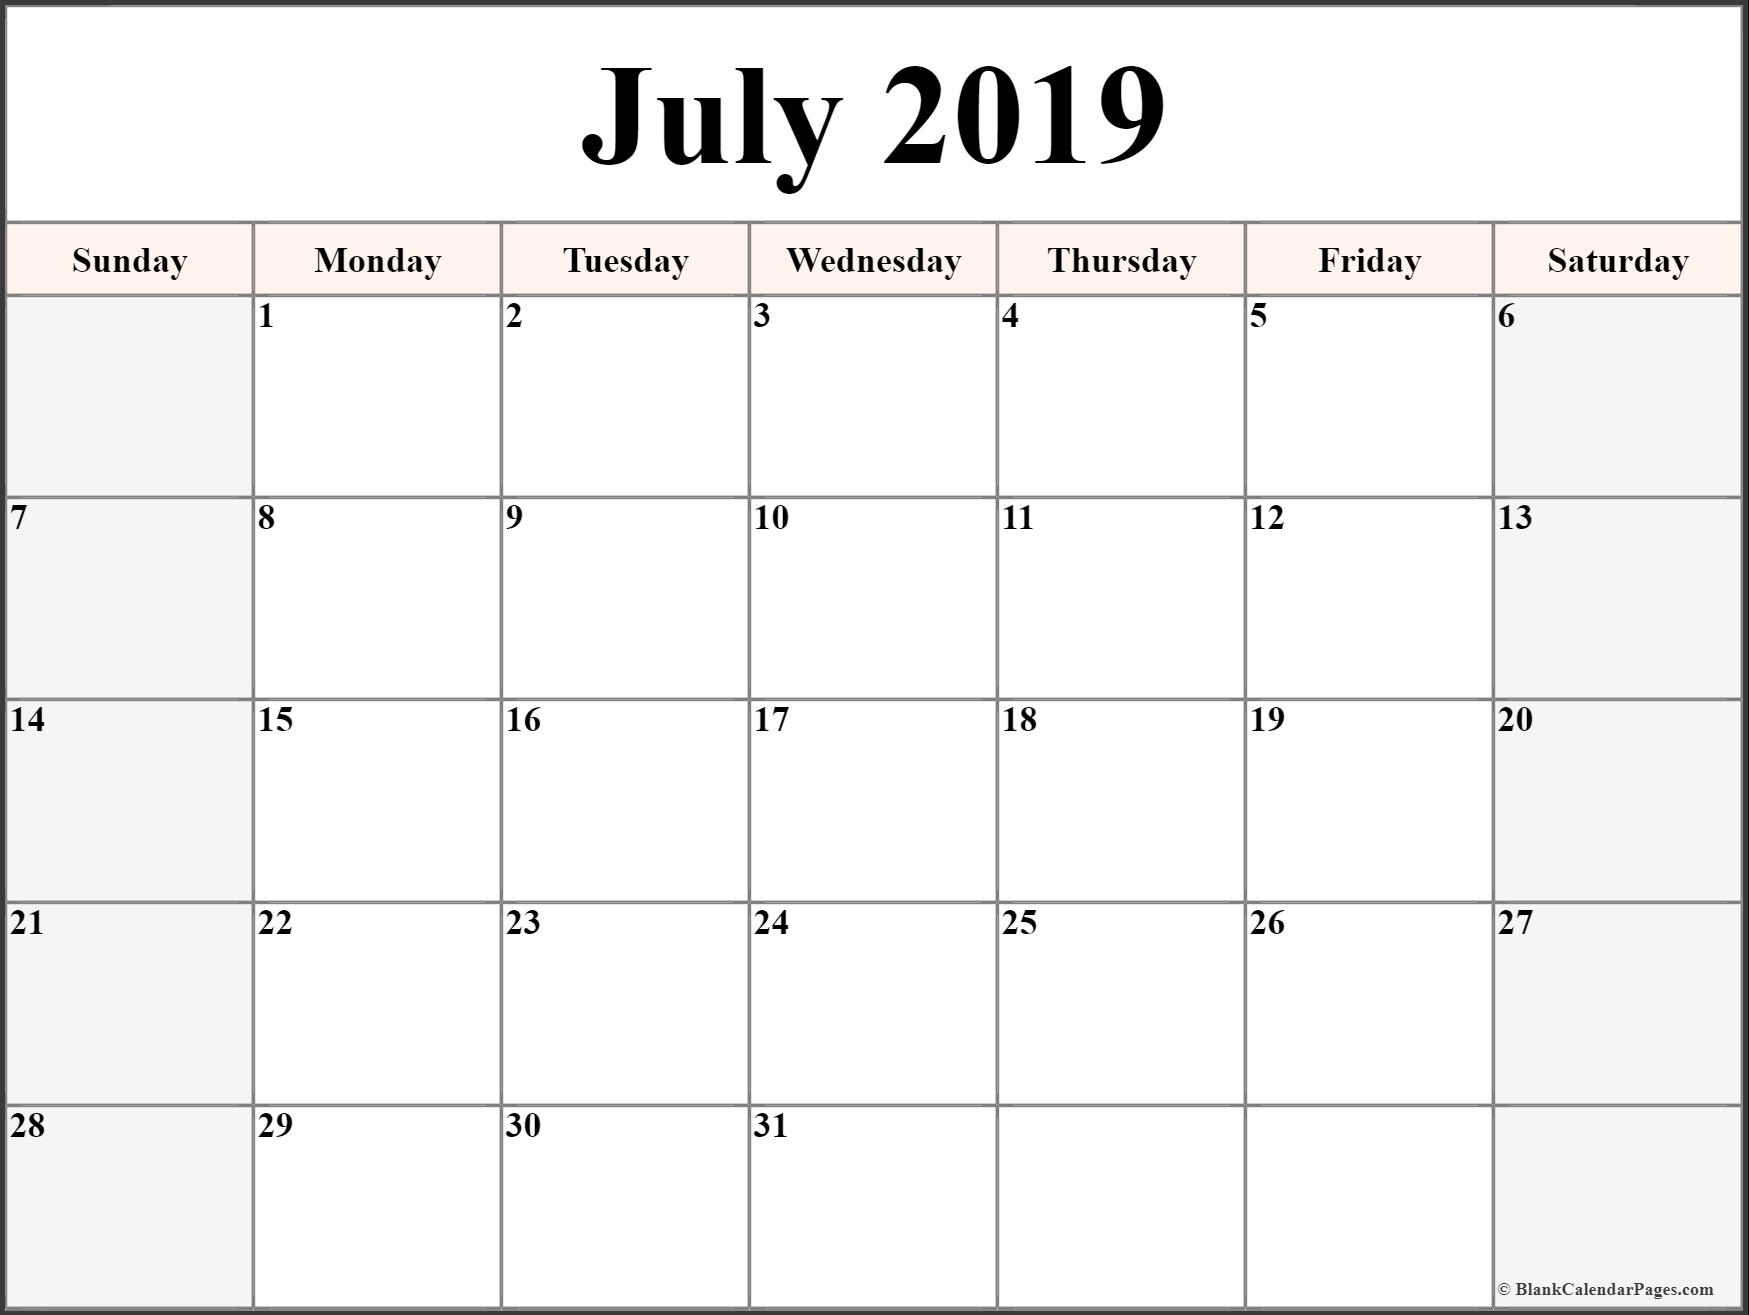 Editable July 2019 Calendar Printable Blank Template With Notes within Blank July Calendar Printable